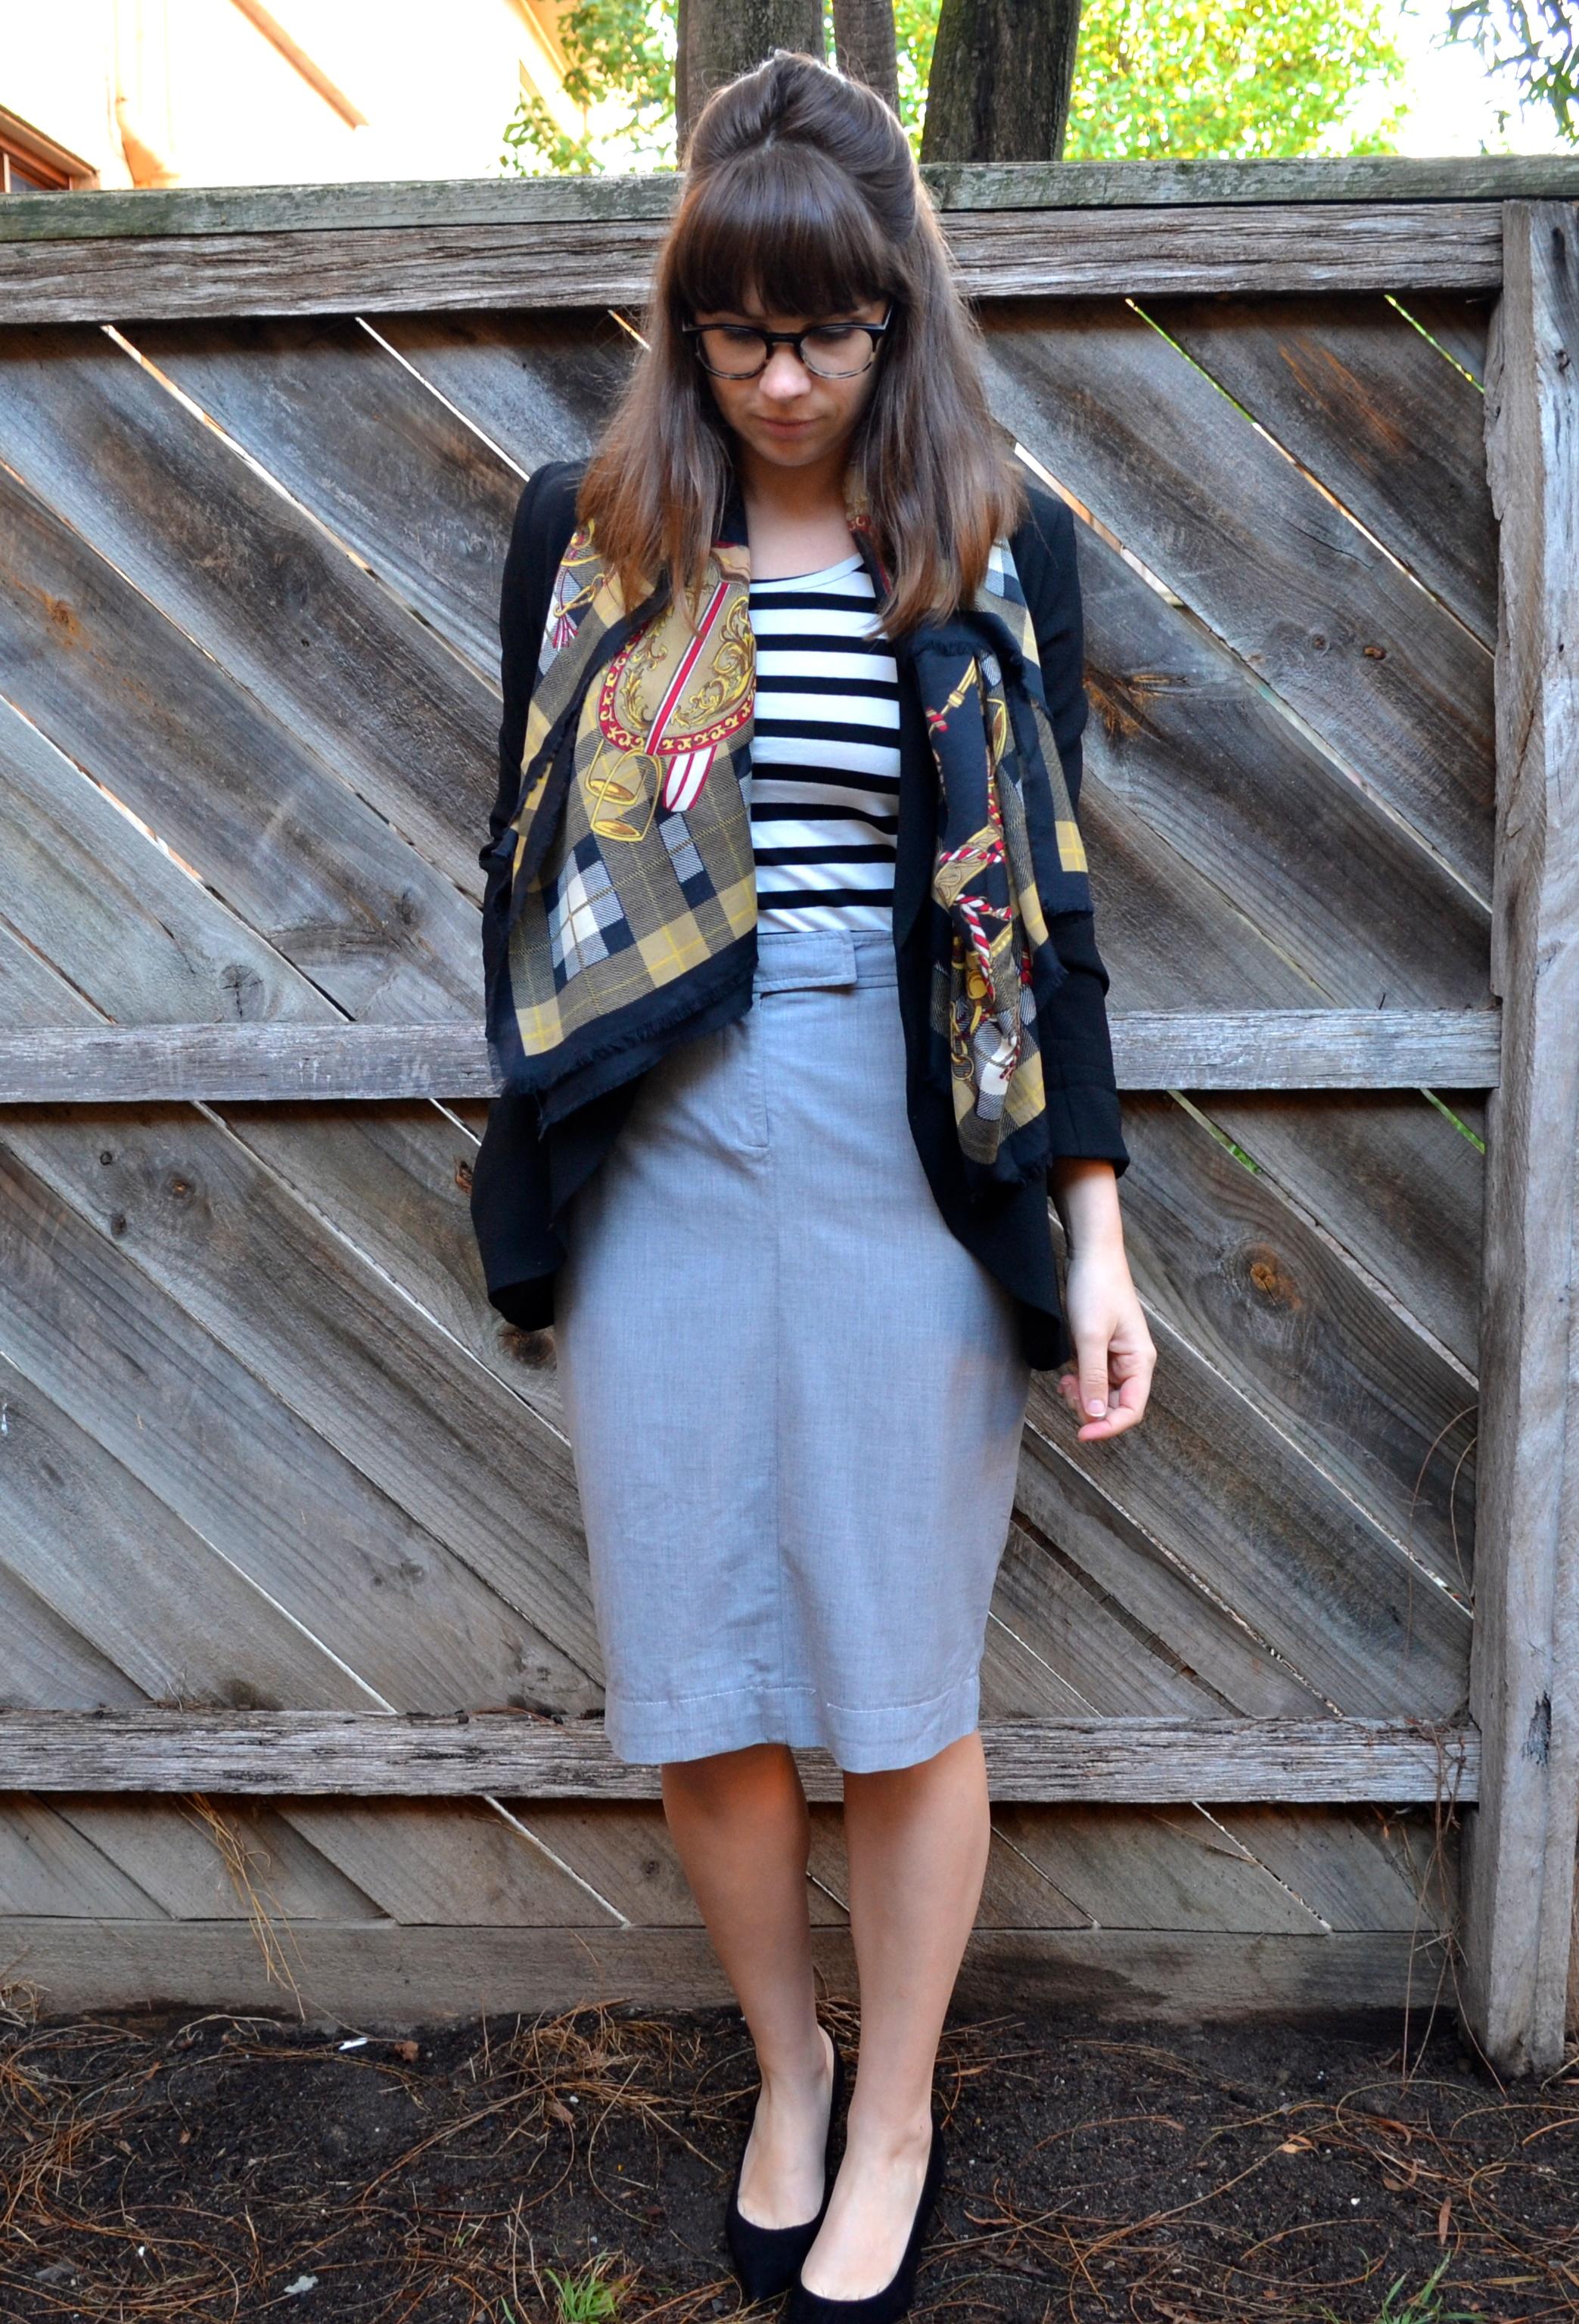 grey-pencil-skirt-striped-top-black-blazer